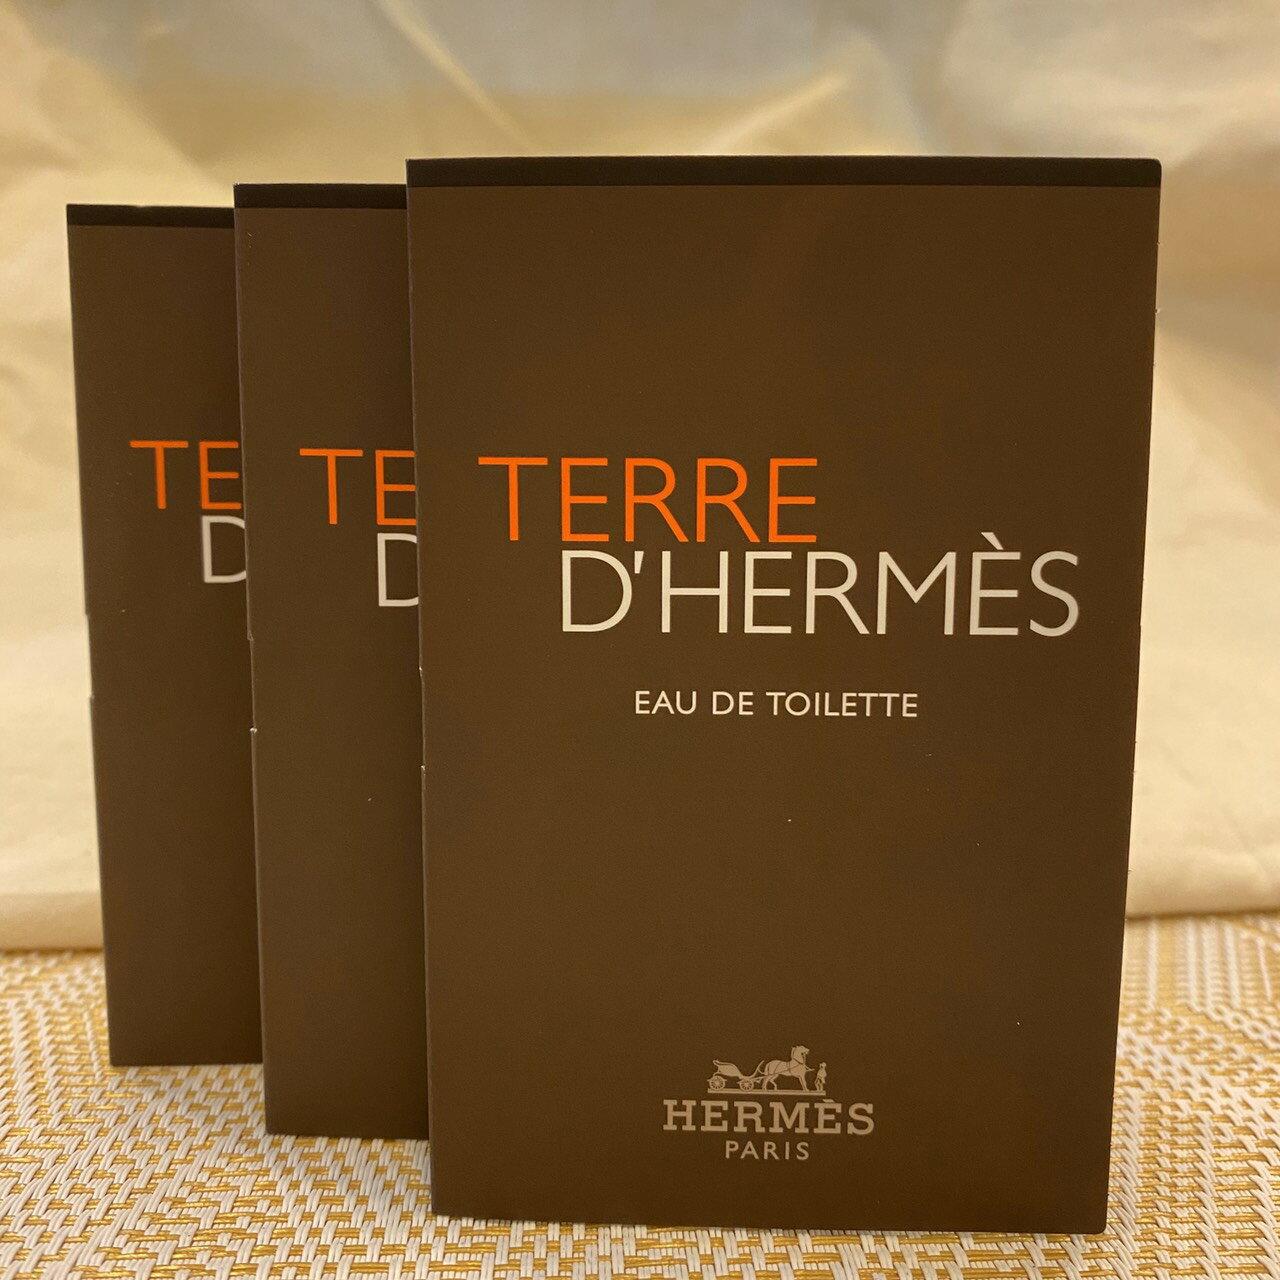 Hermes 愛馬仕大地極致清新淡香水 / Terre d'Hermes / 針管 / 試管 / 2ml*3 1